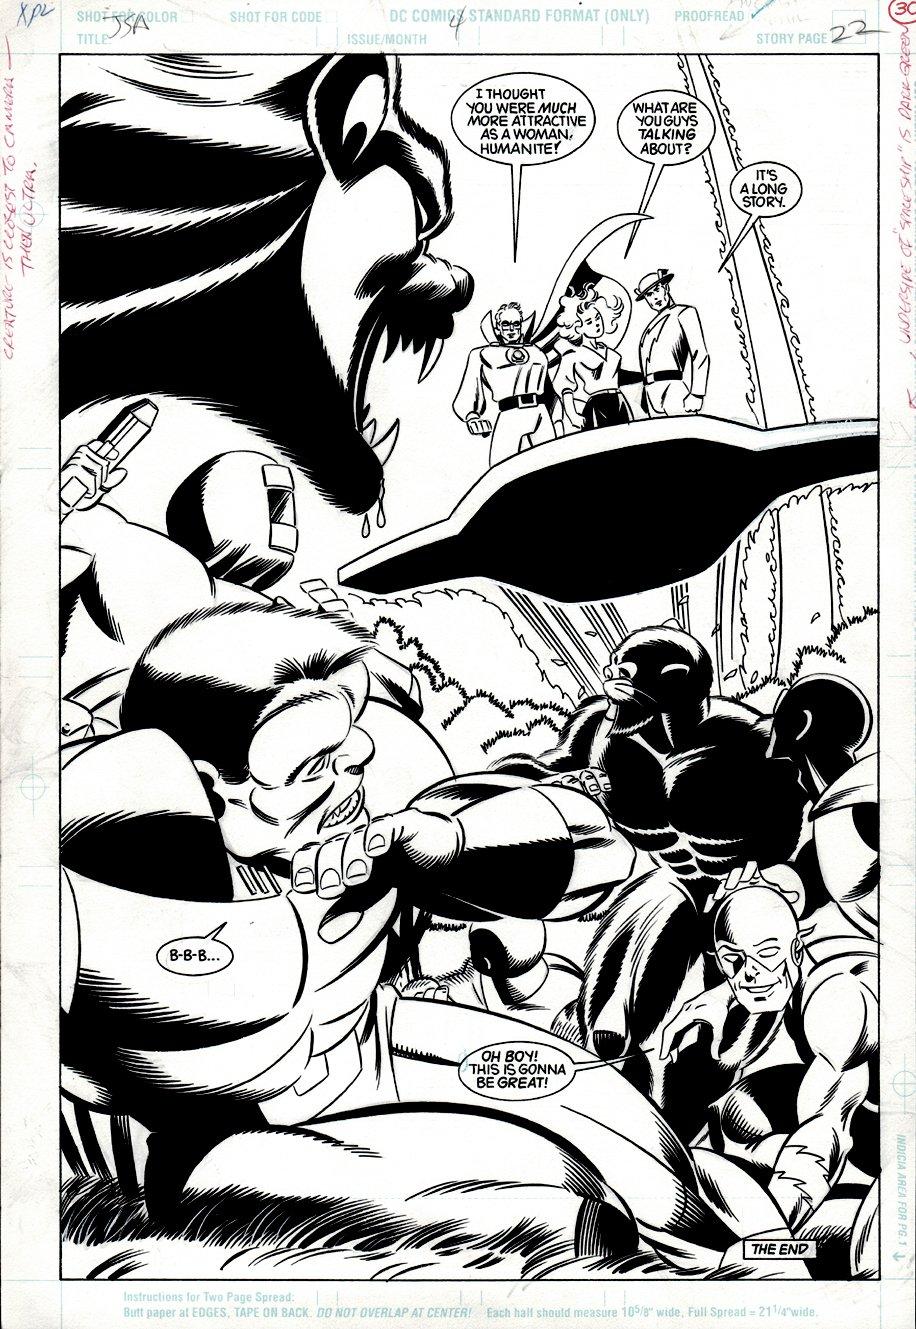 Justice Society of America #4 p 22 SPLASH (Golden Age Flash, Green Lantern, Dr. Mid-Nite, Wildcat, Flash!) 1992